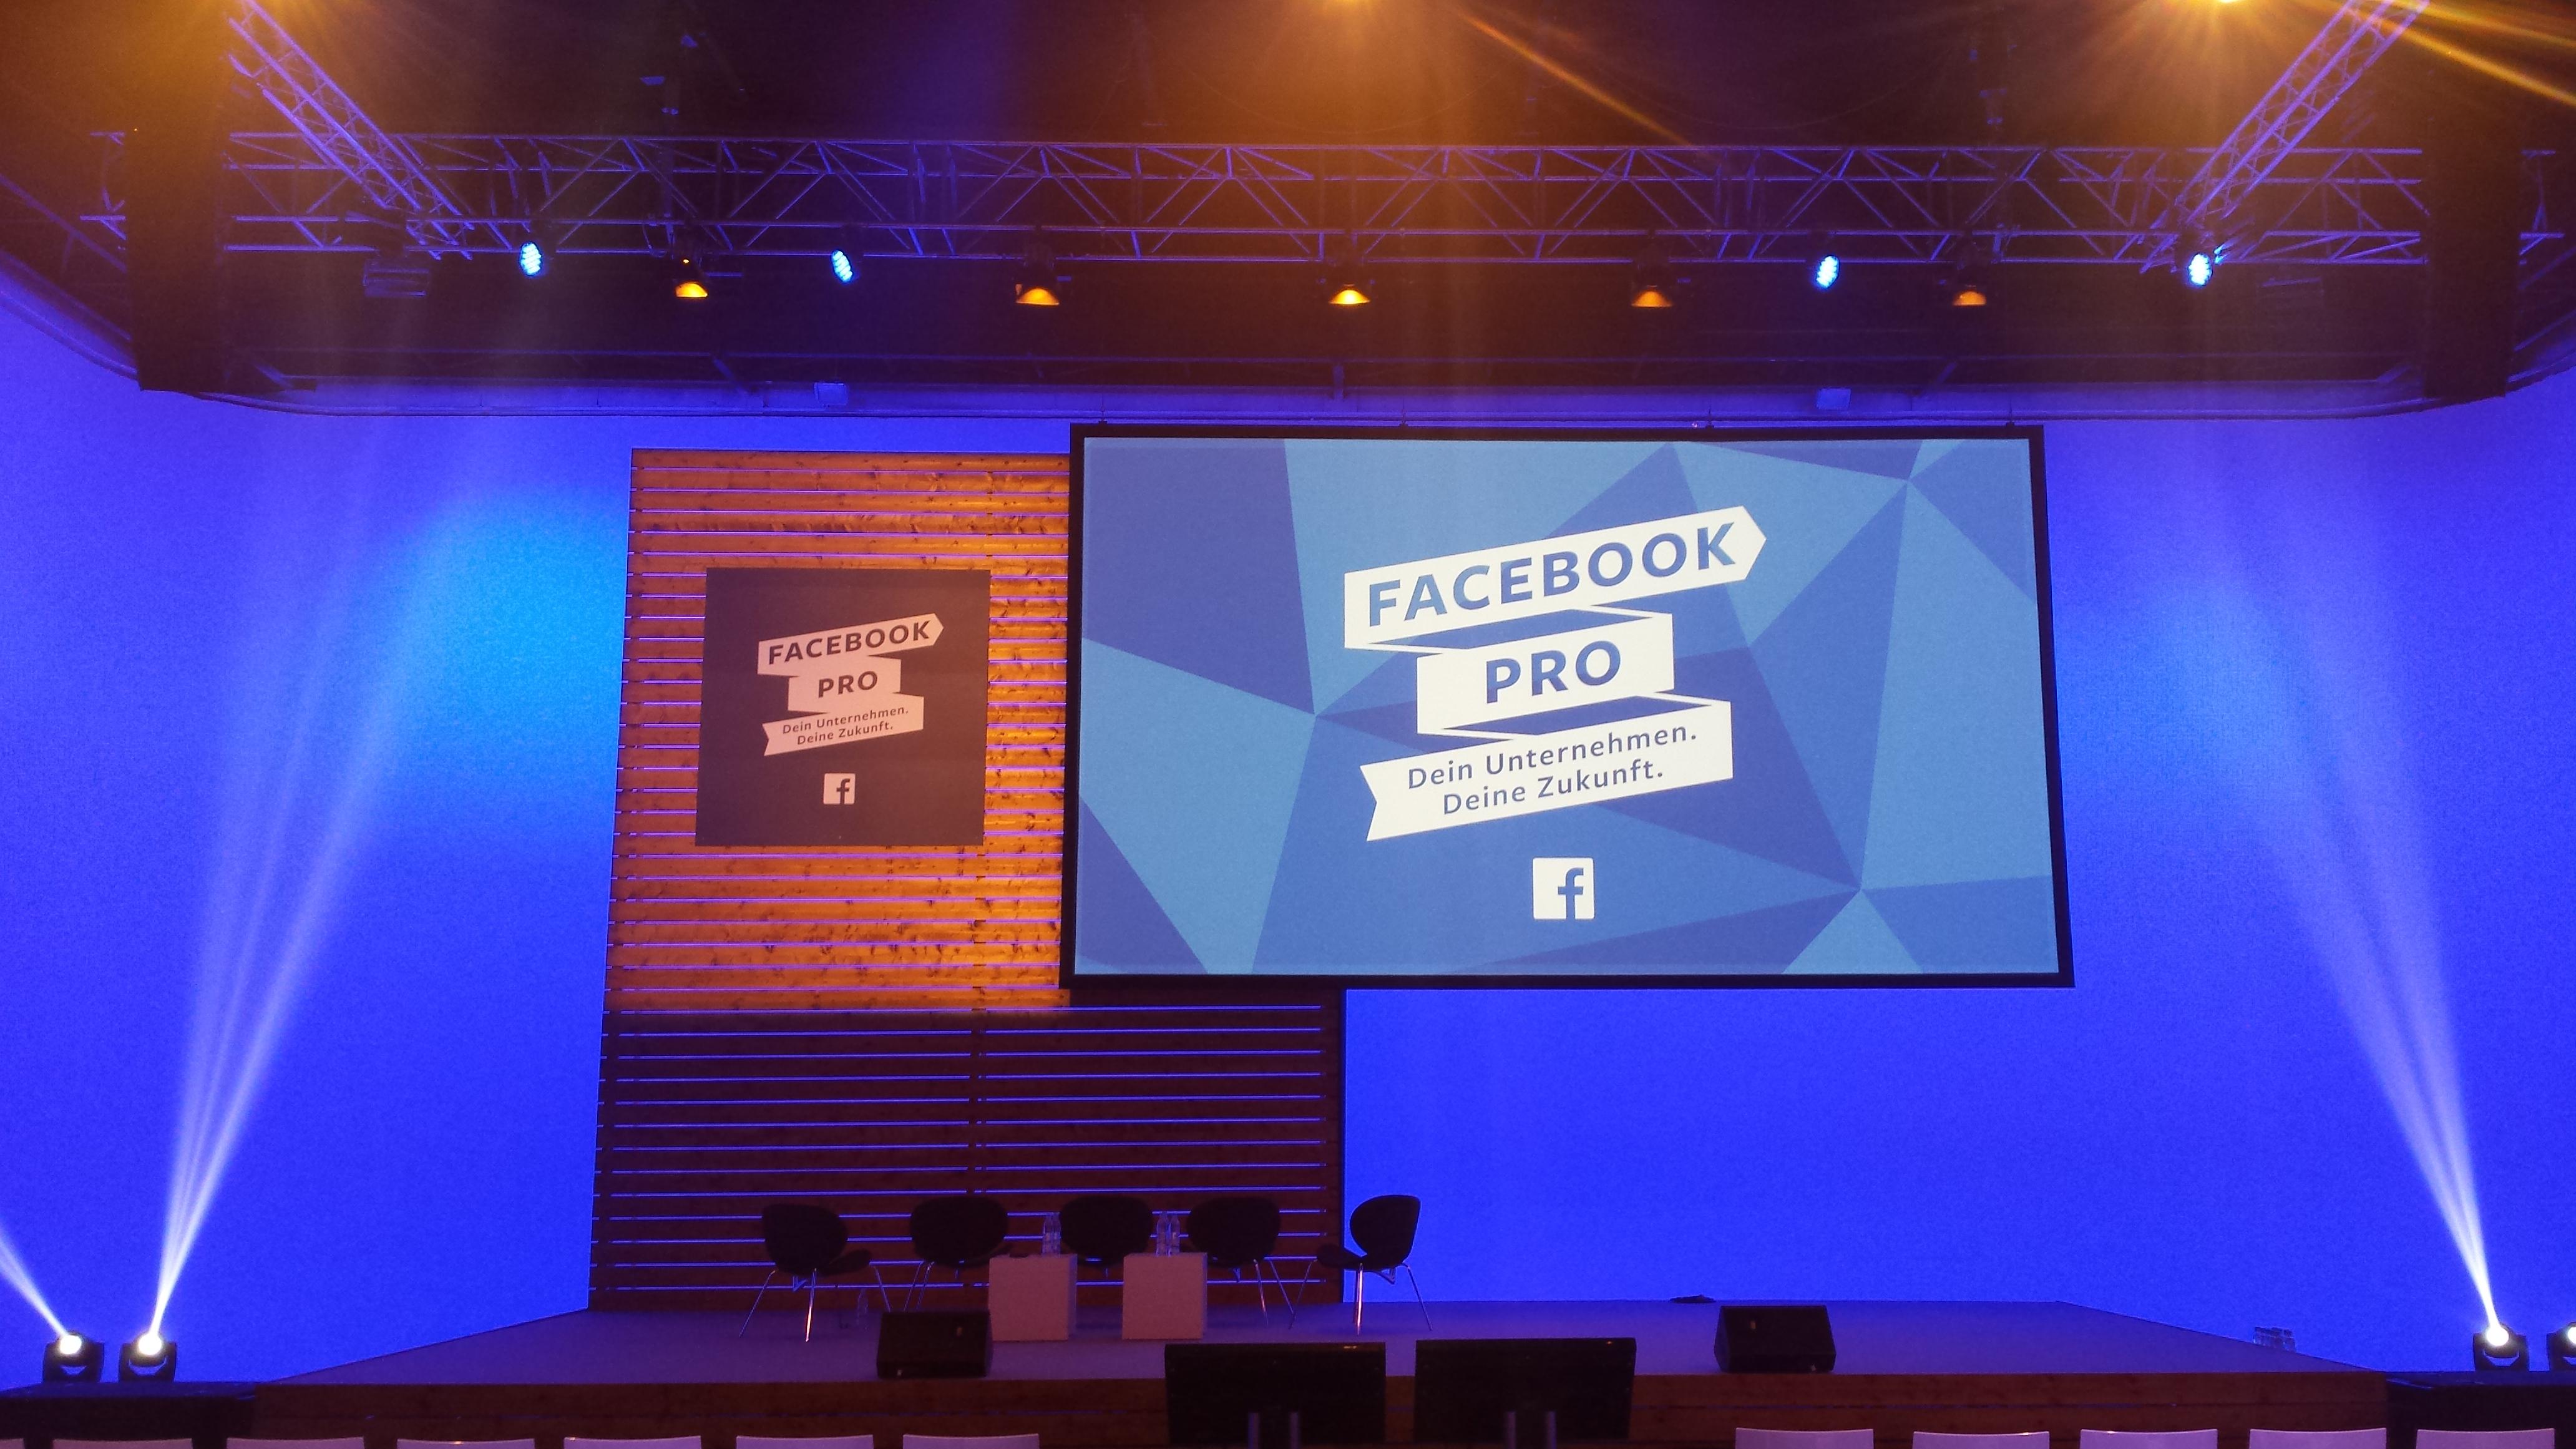 Facebook Pro München